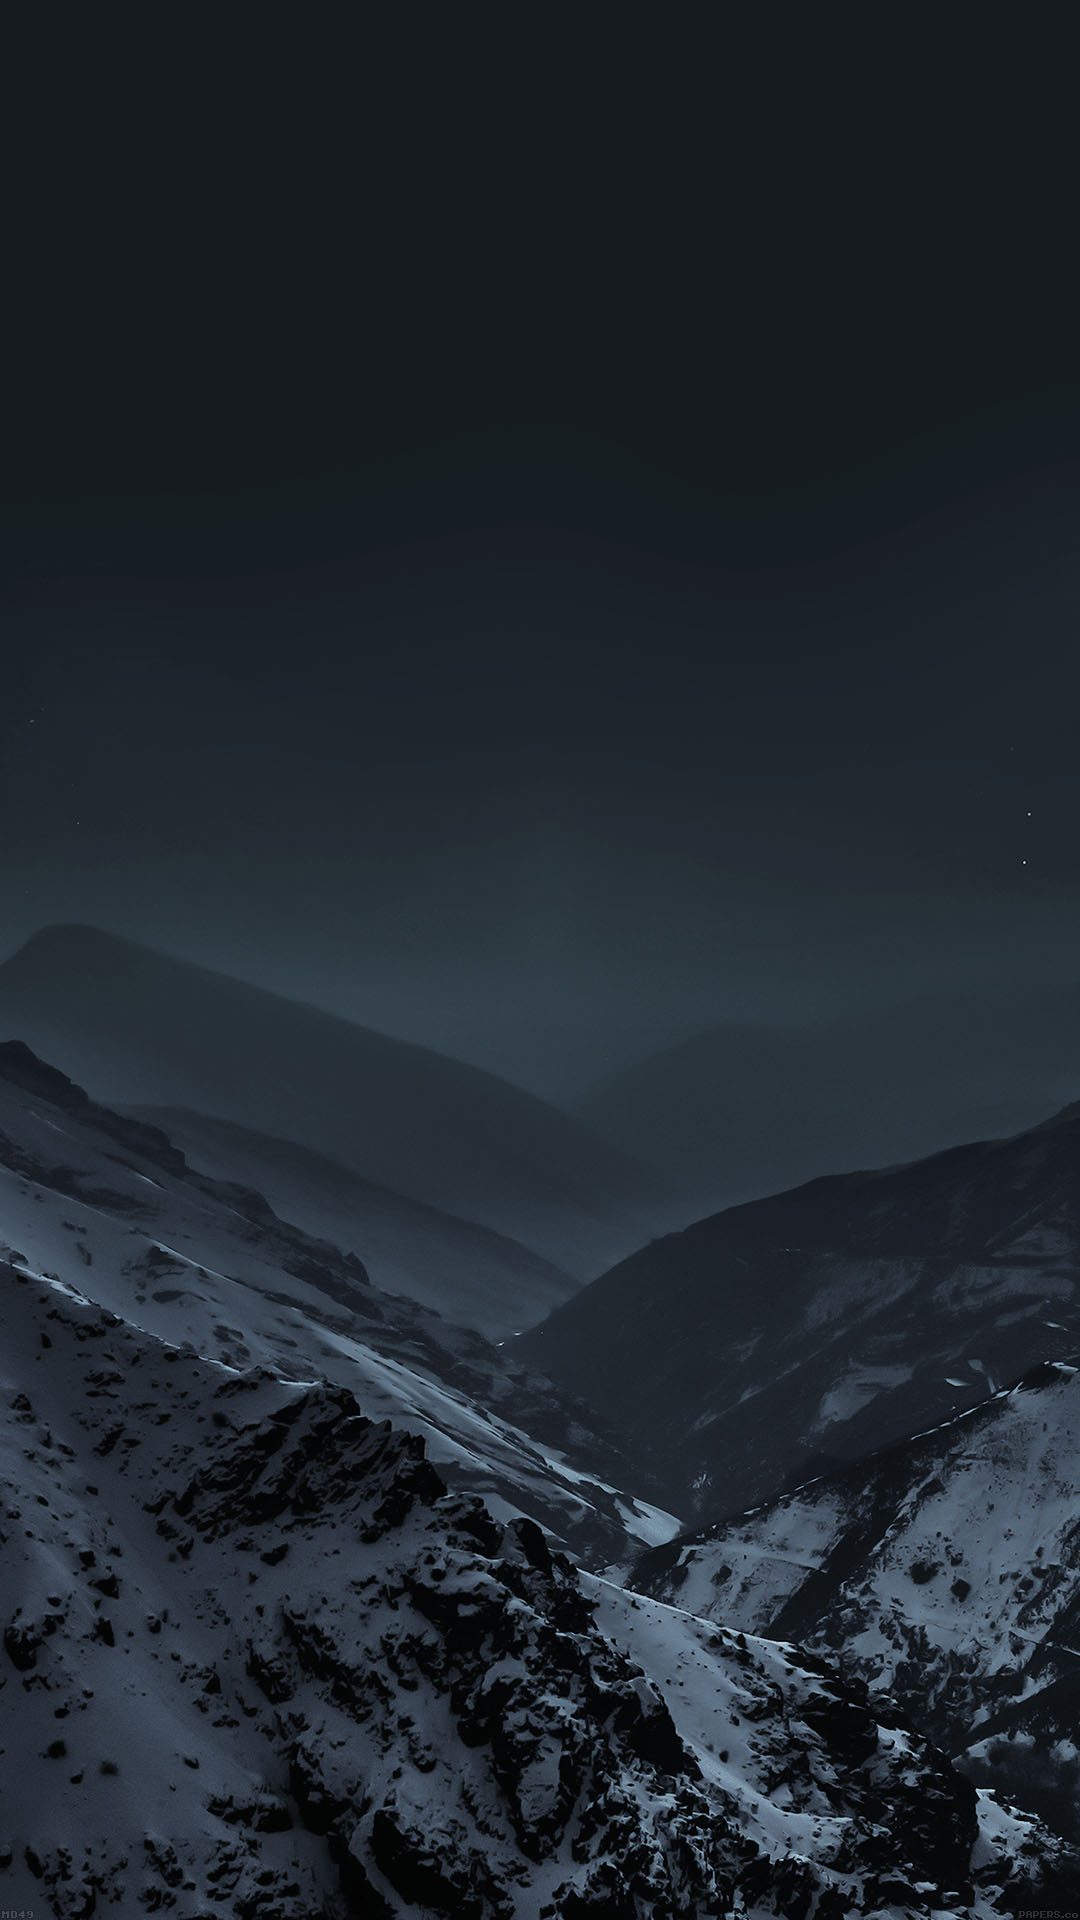 Wallpaper Nature Earth Dark Asleep Mountain Night